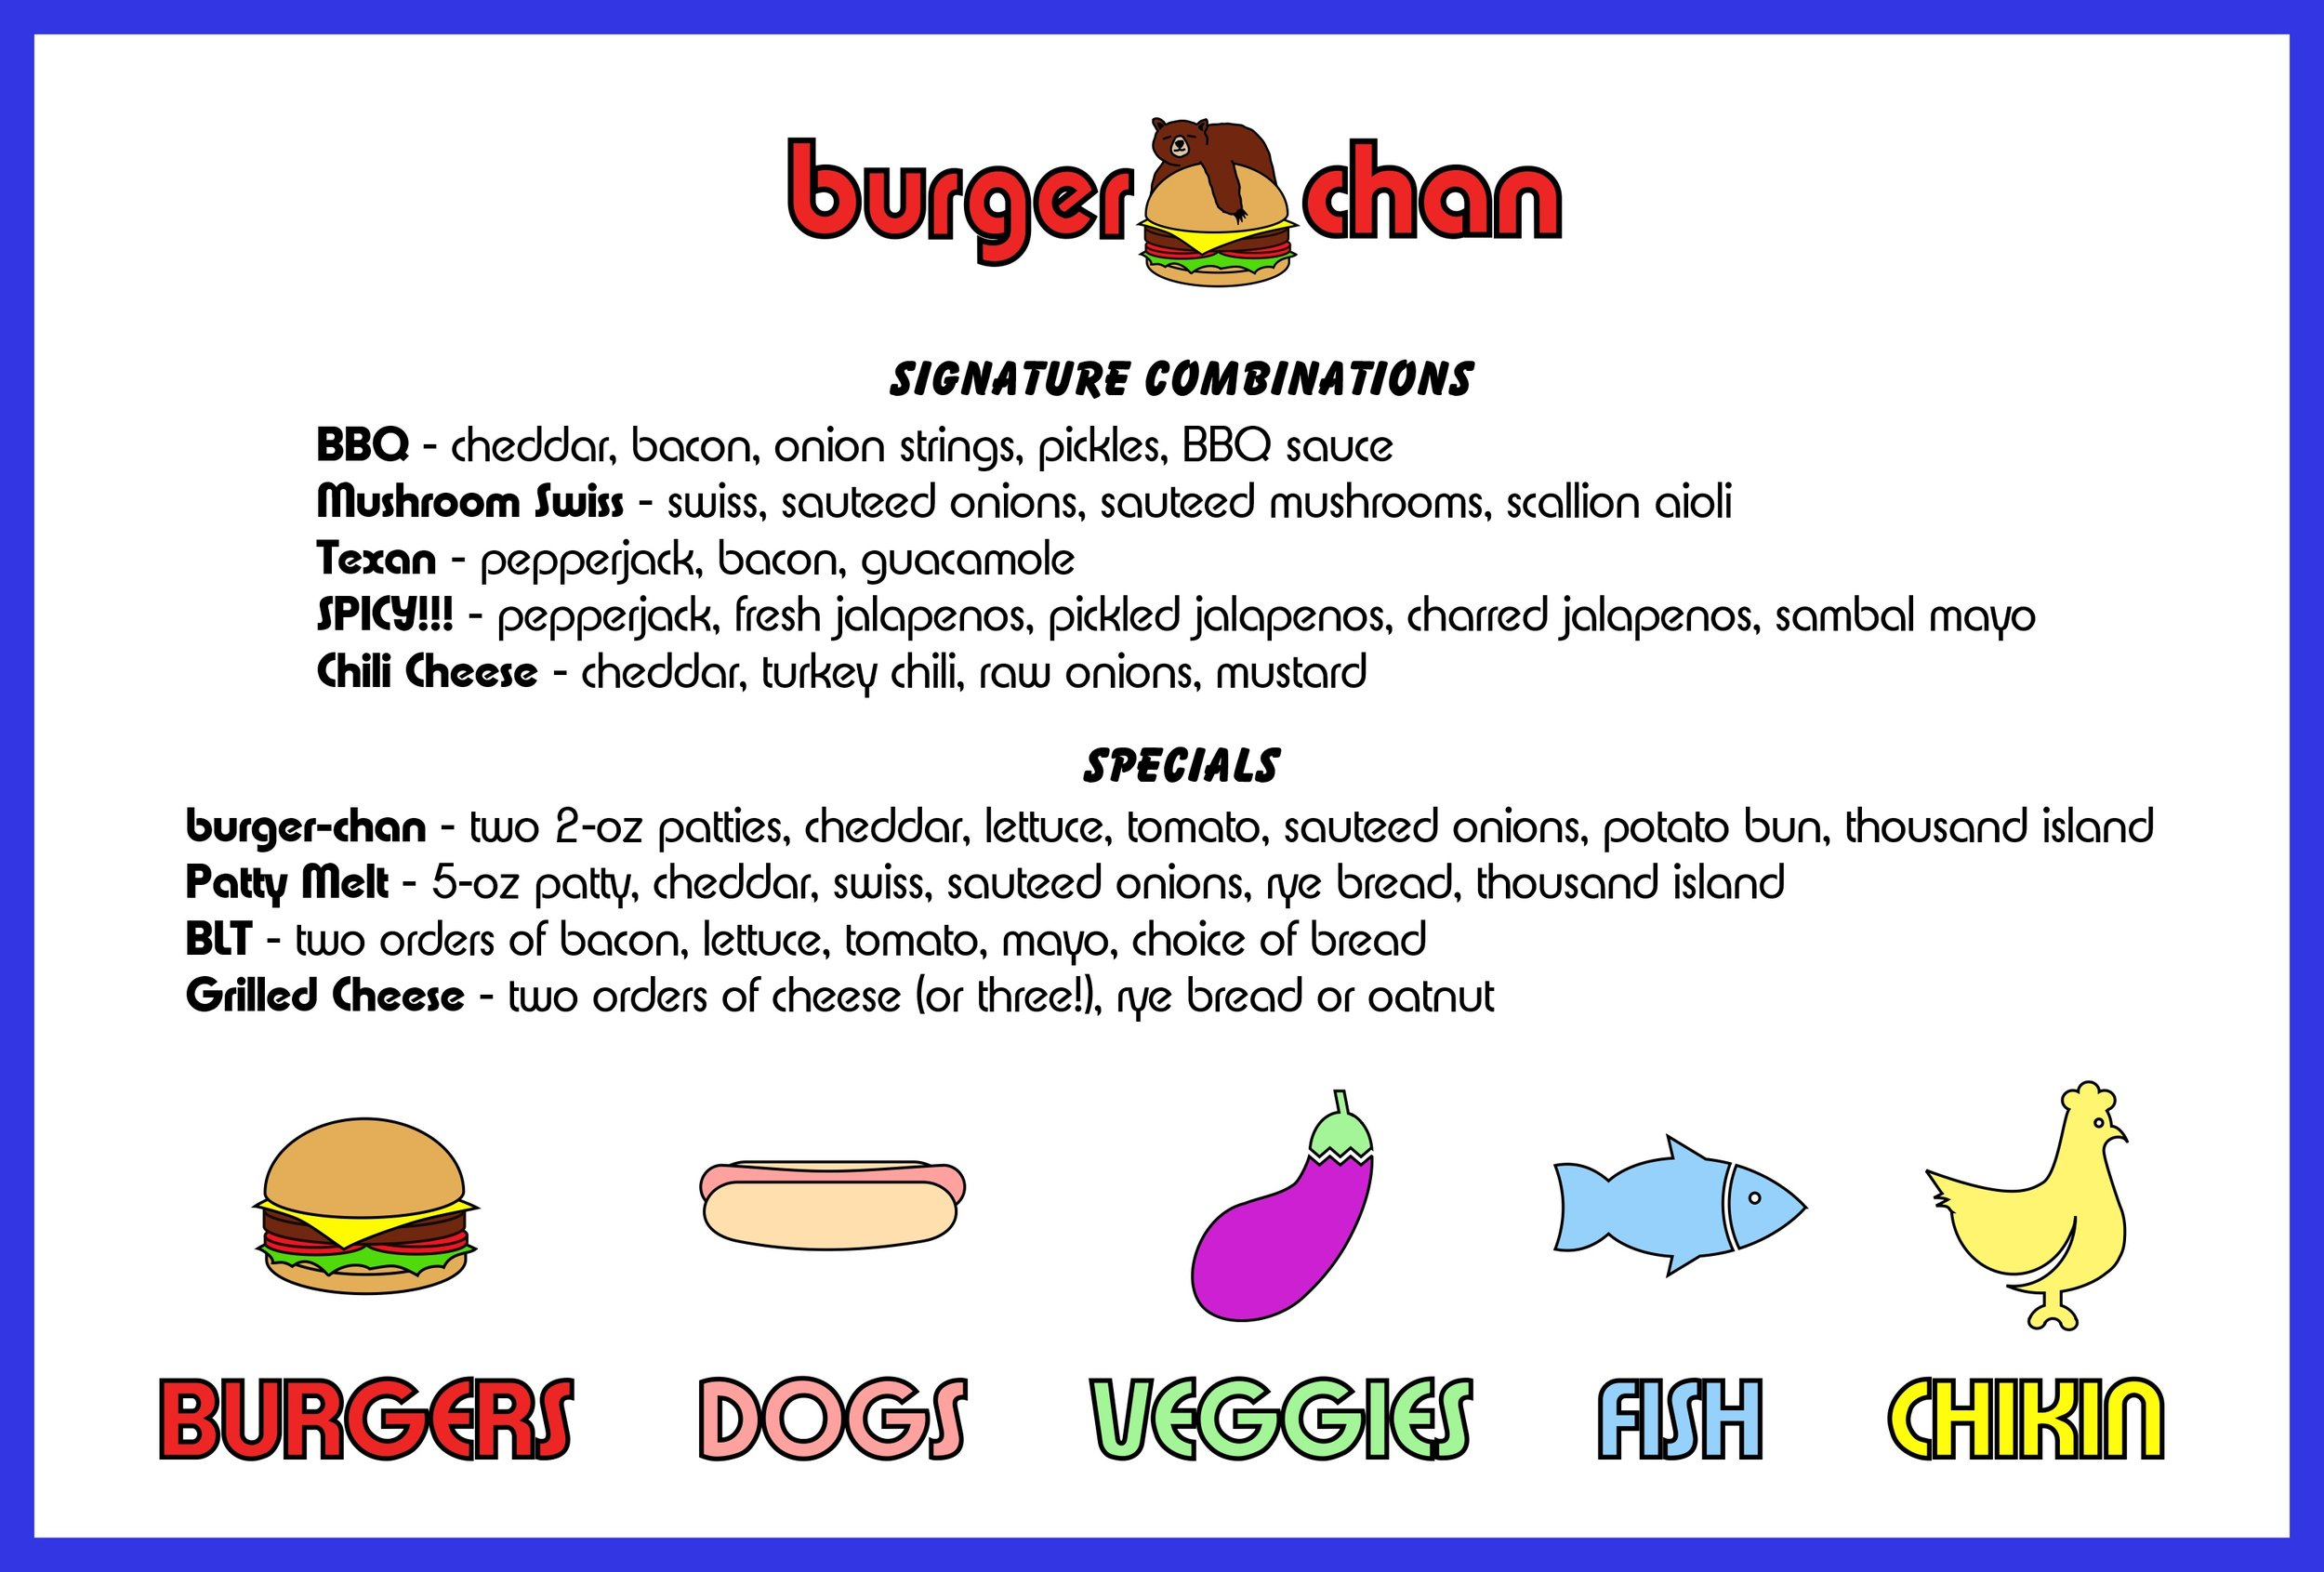 burger-chan Big Menu Board.jpg